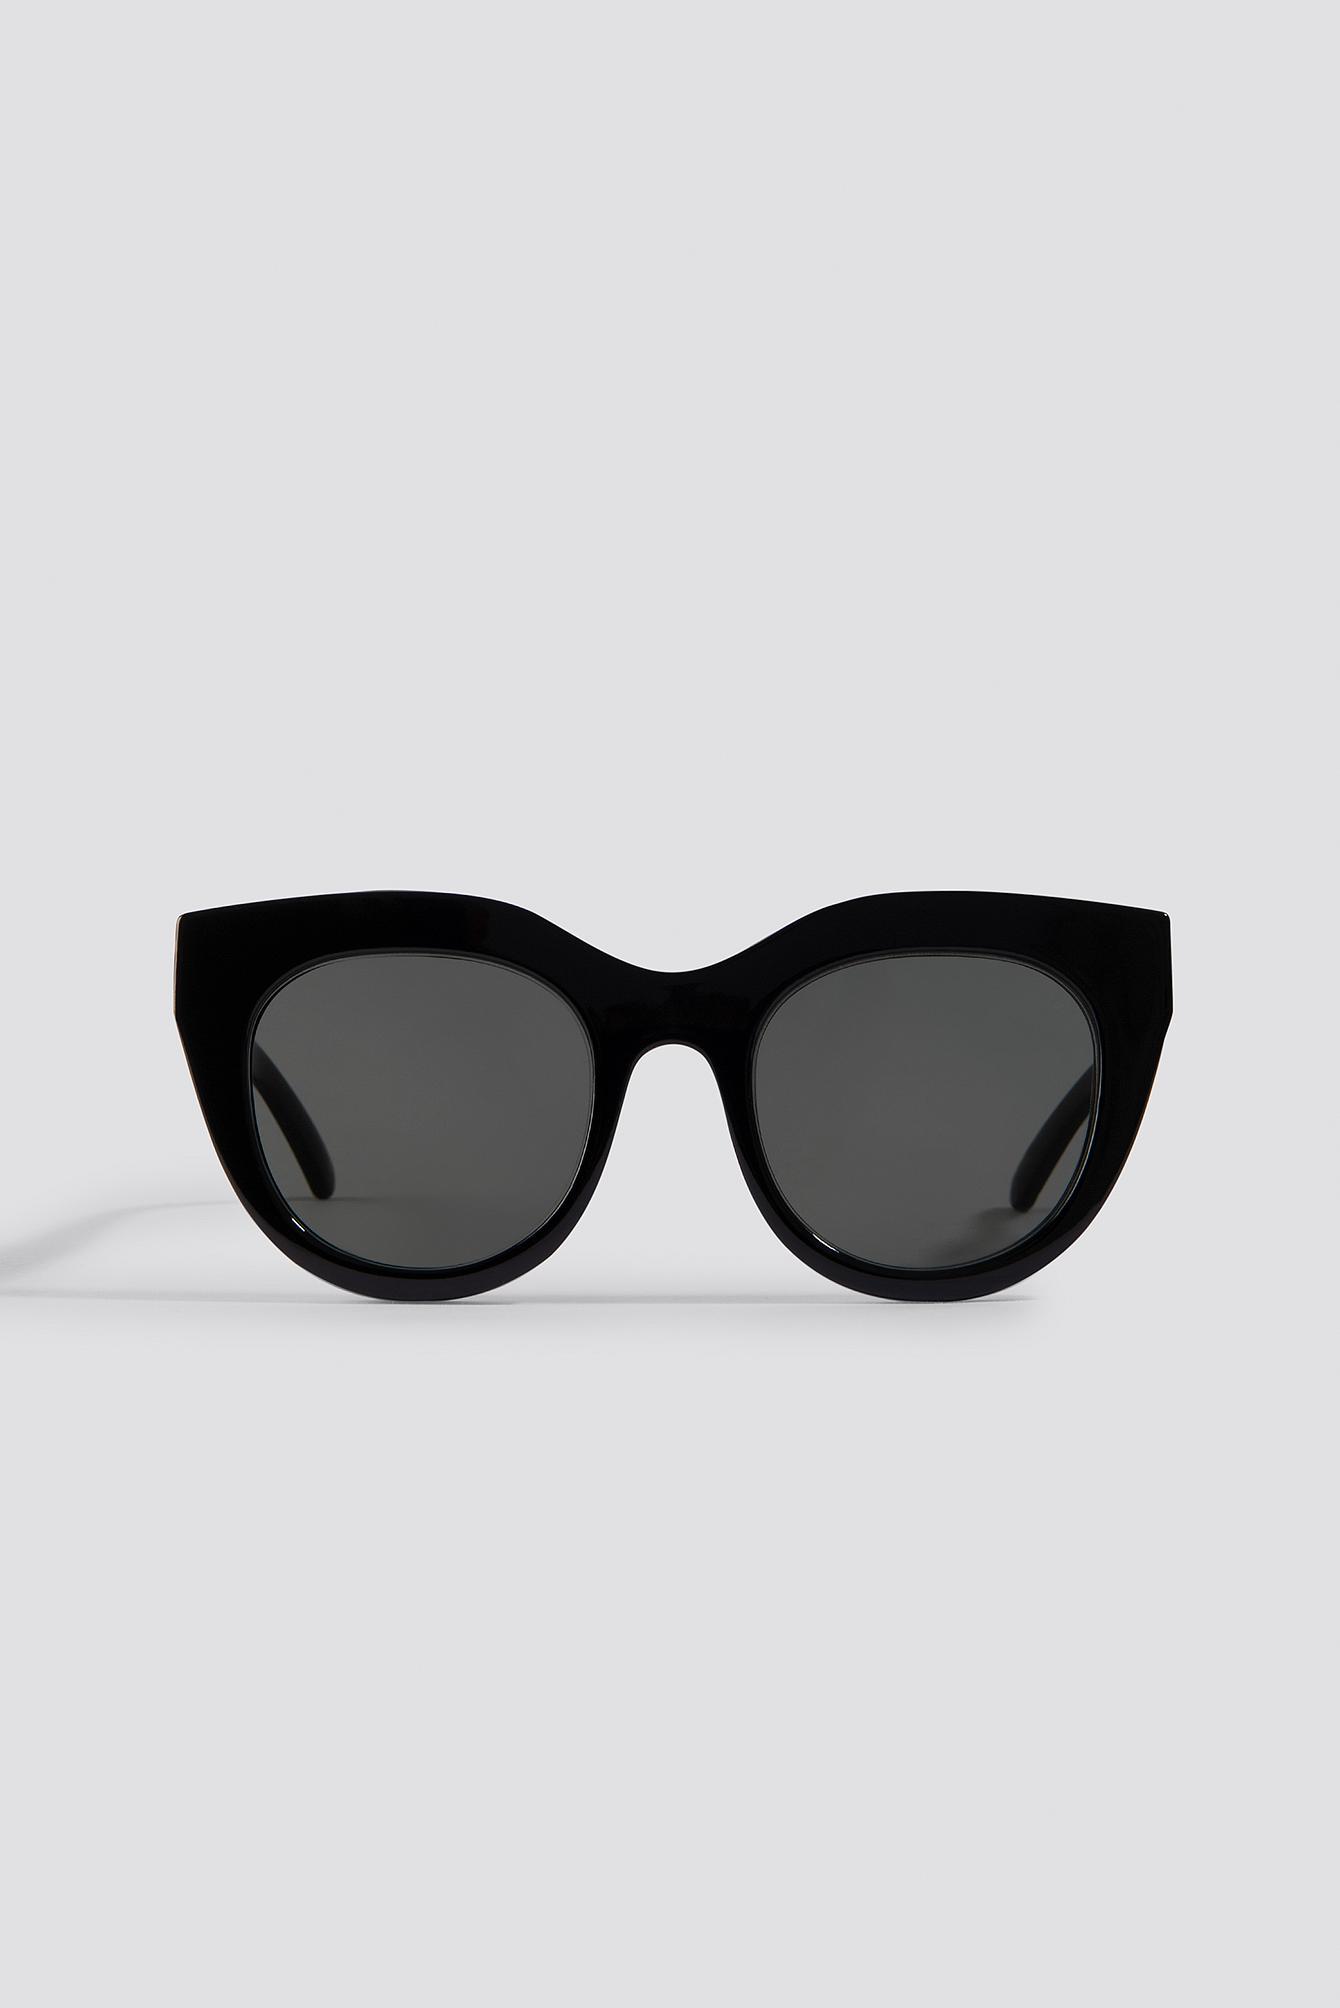 d833d28e188 Le Specs Air Heart Black gold in Black - Save 26% - Lyst